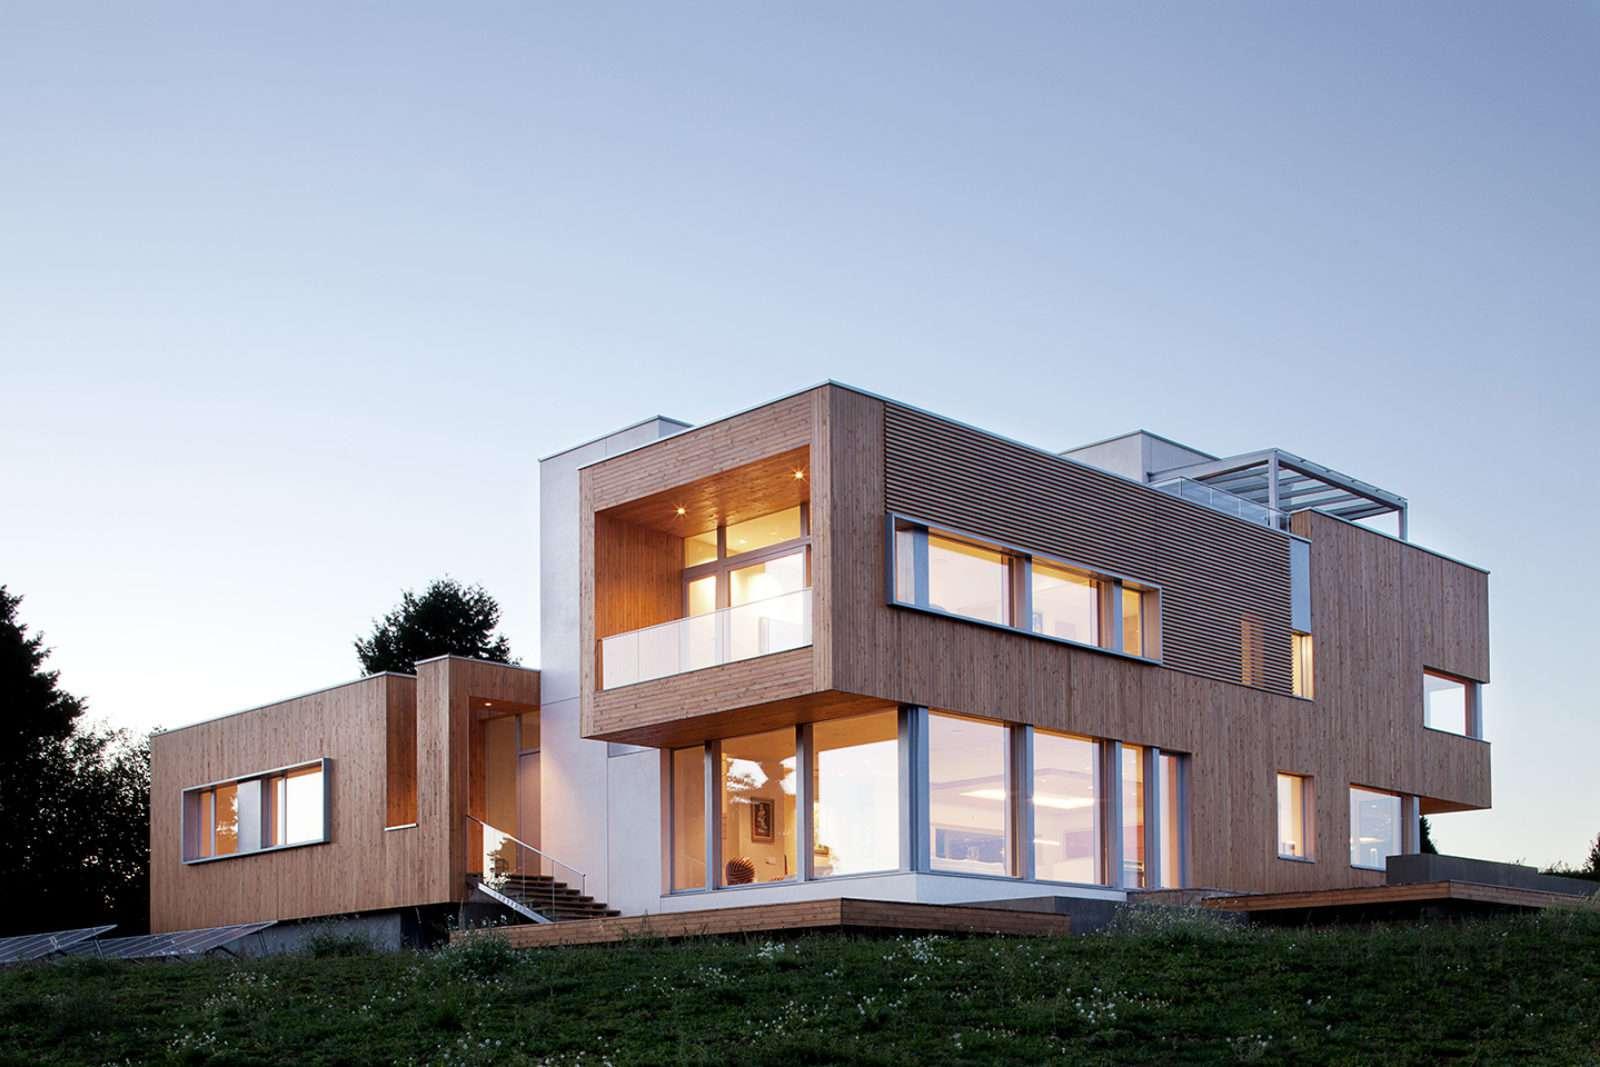 Casa ecológica con muchas ventanas